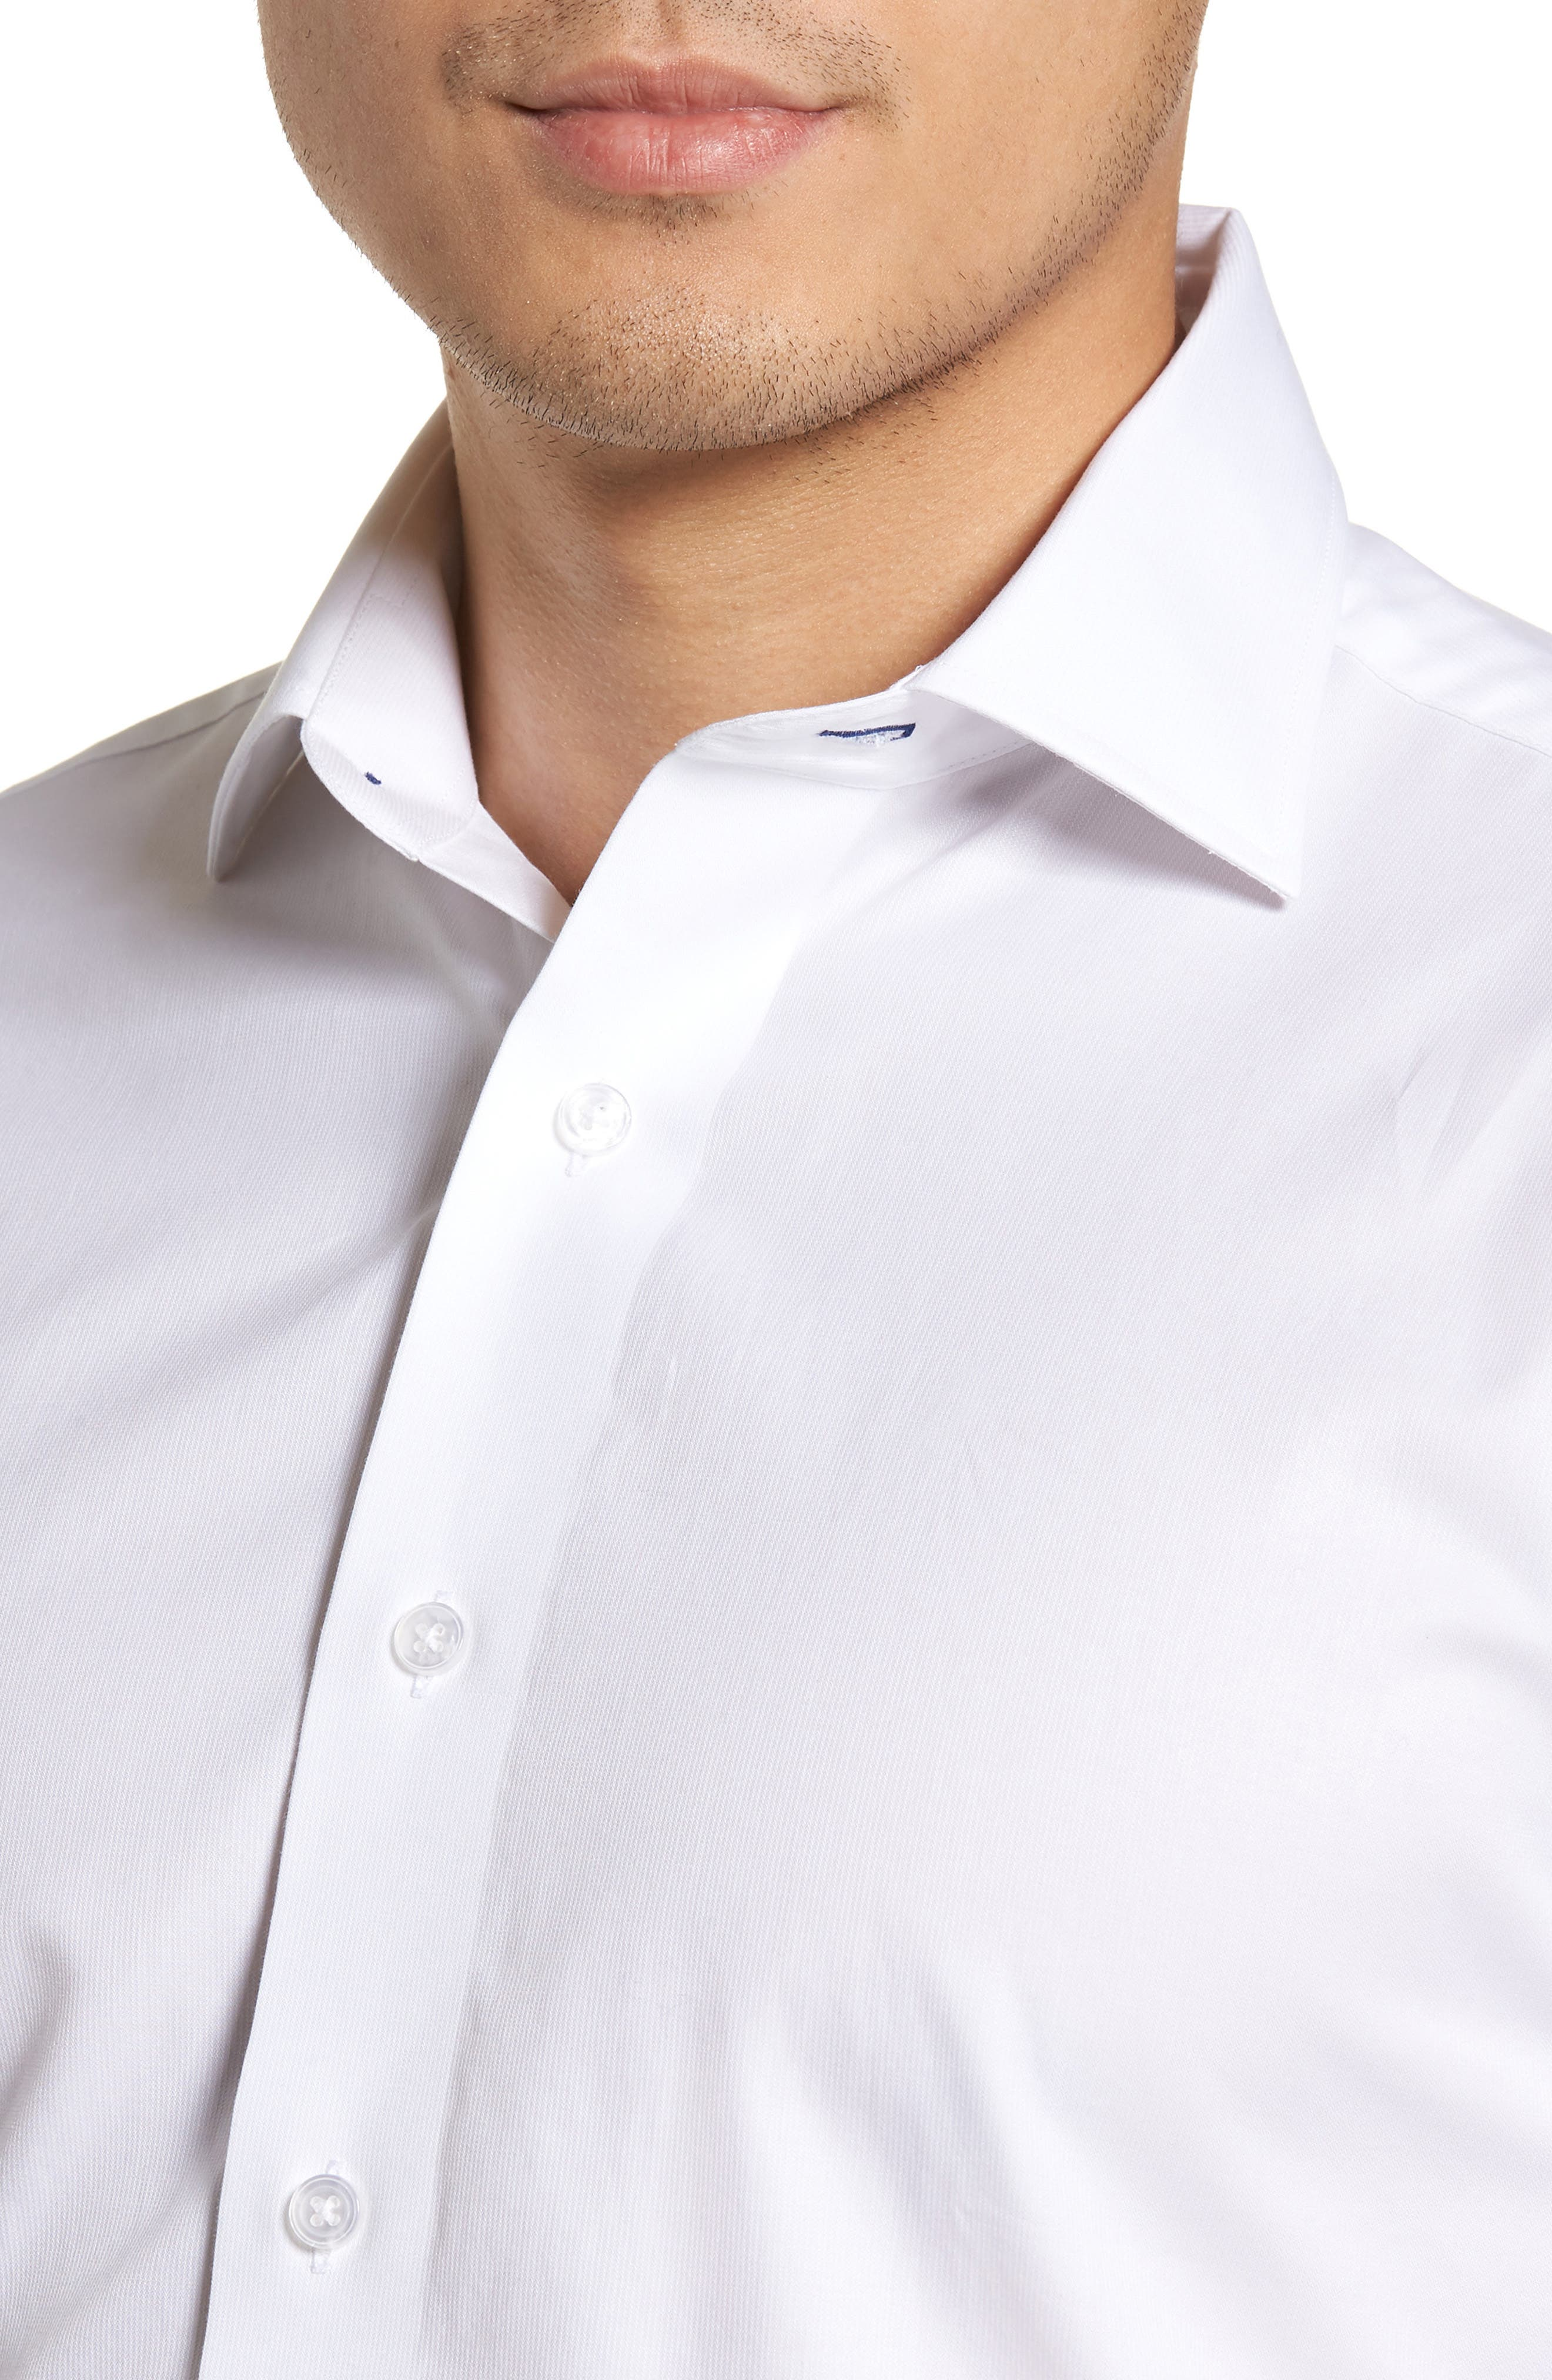 LORENZO UOMO, Trim Fit Solid Dress Shirt, Alternate thumbnail 2, color, WHITE